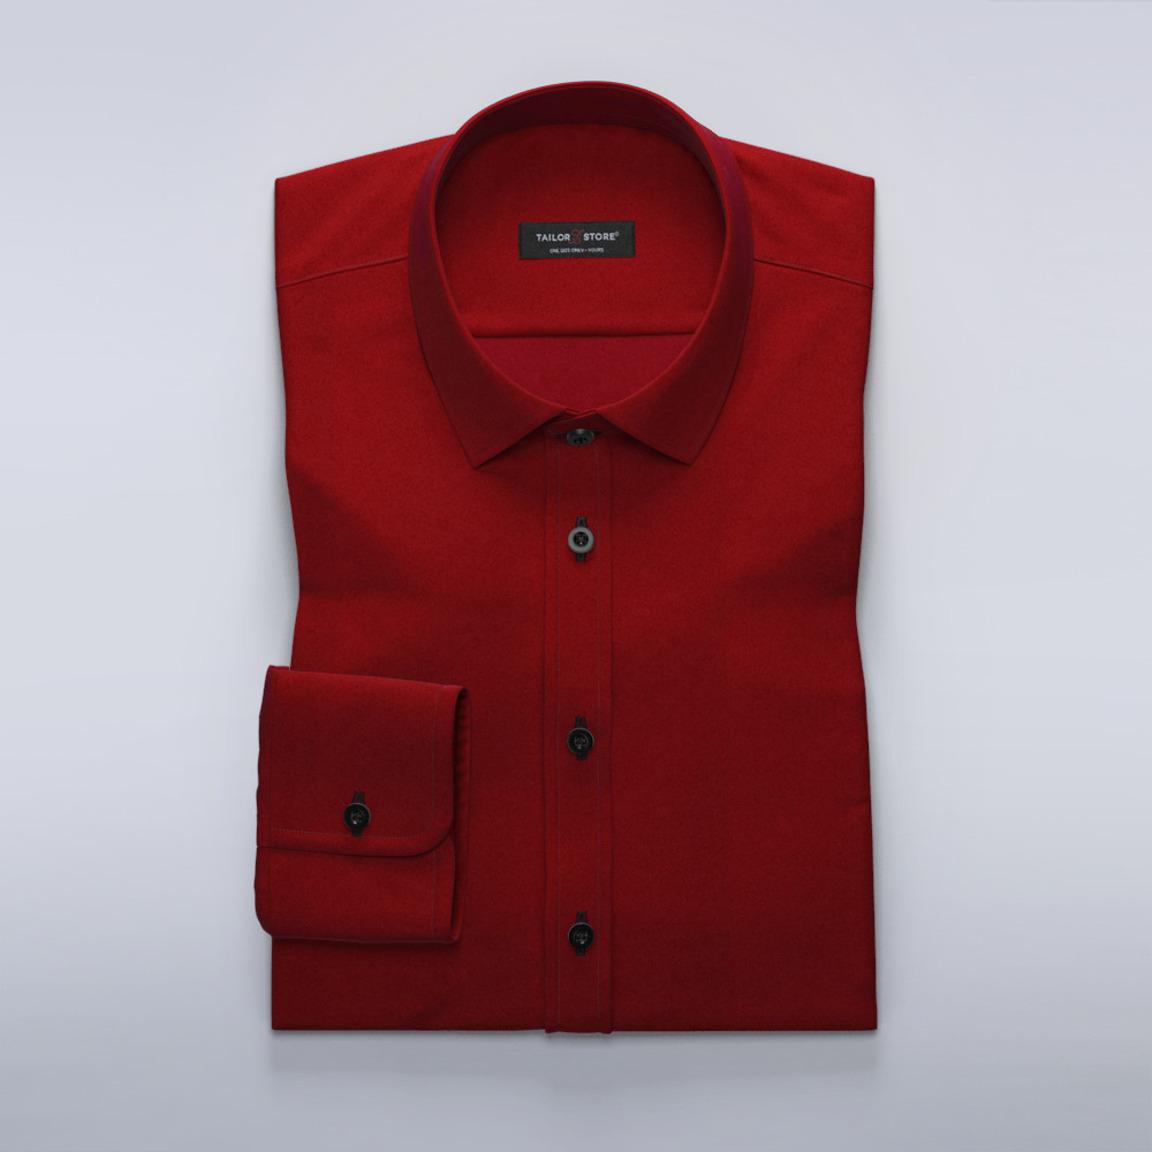 Weinrotes Baumwoll-Satin-Hemd